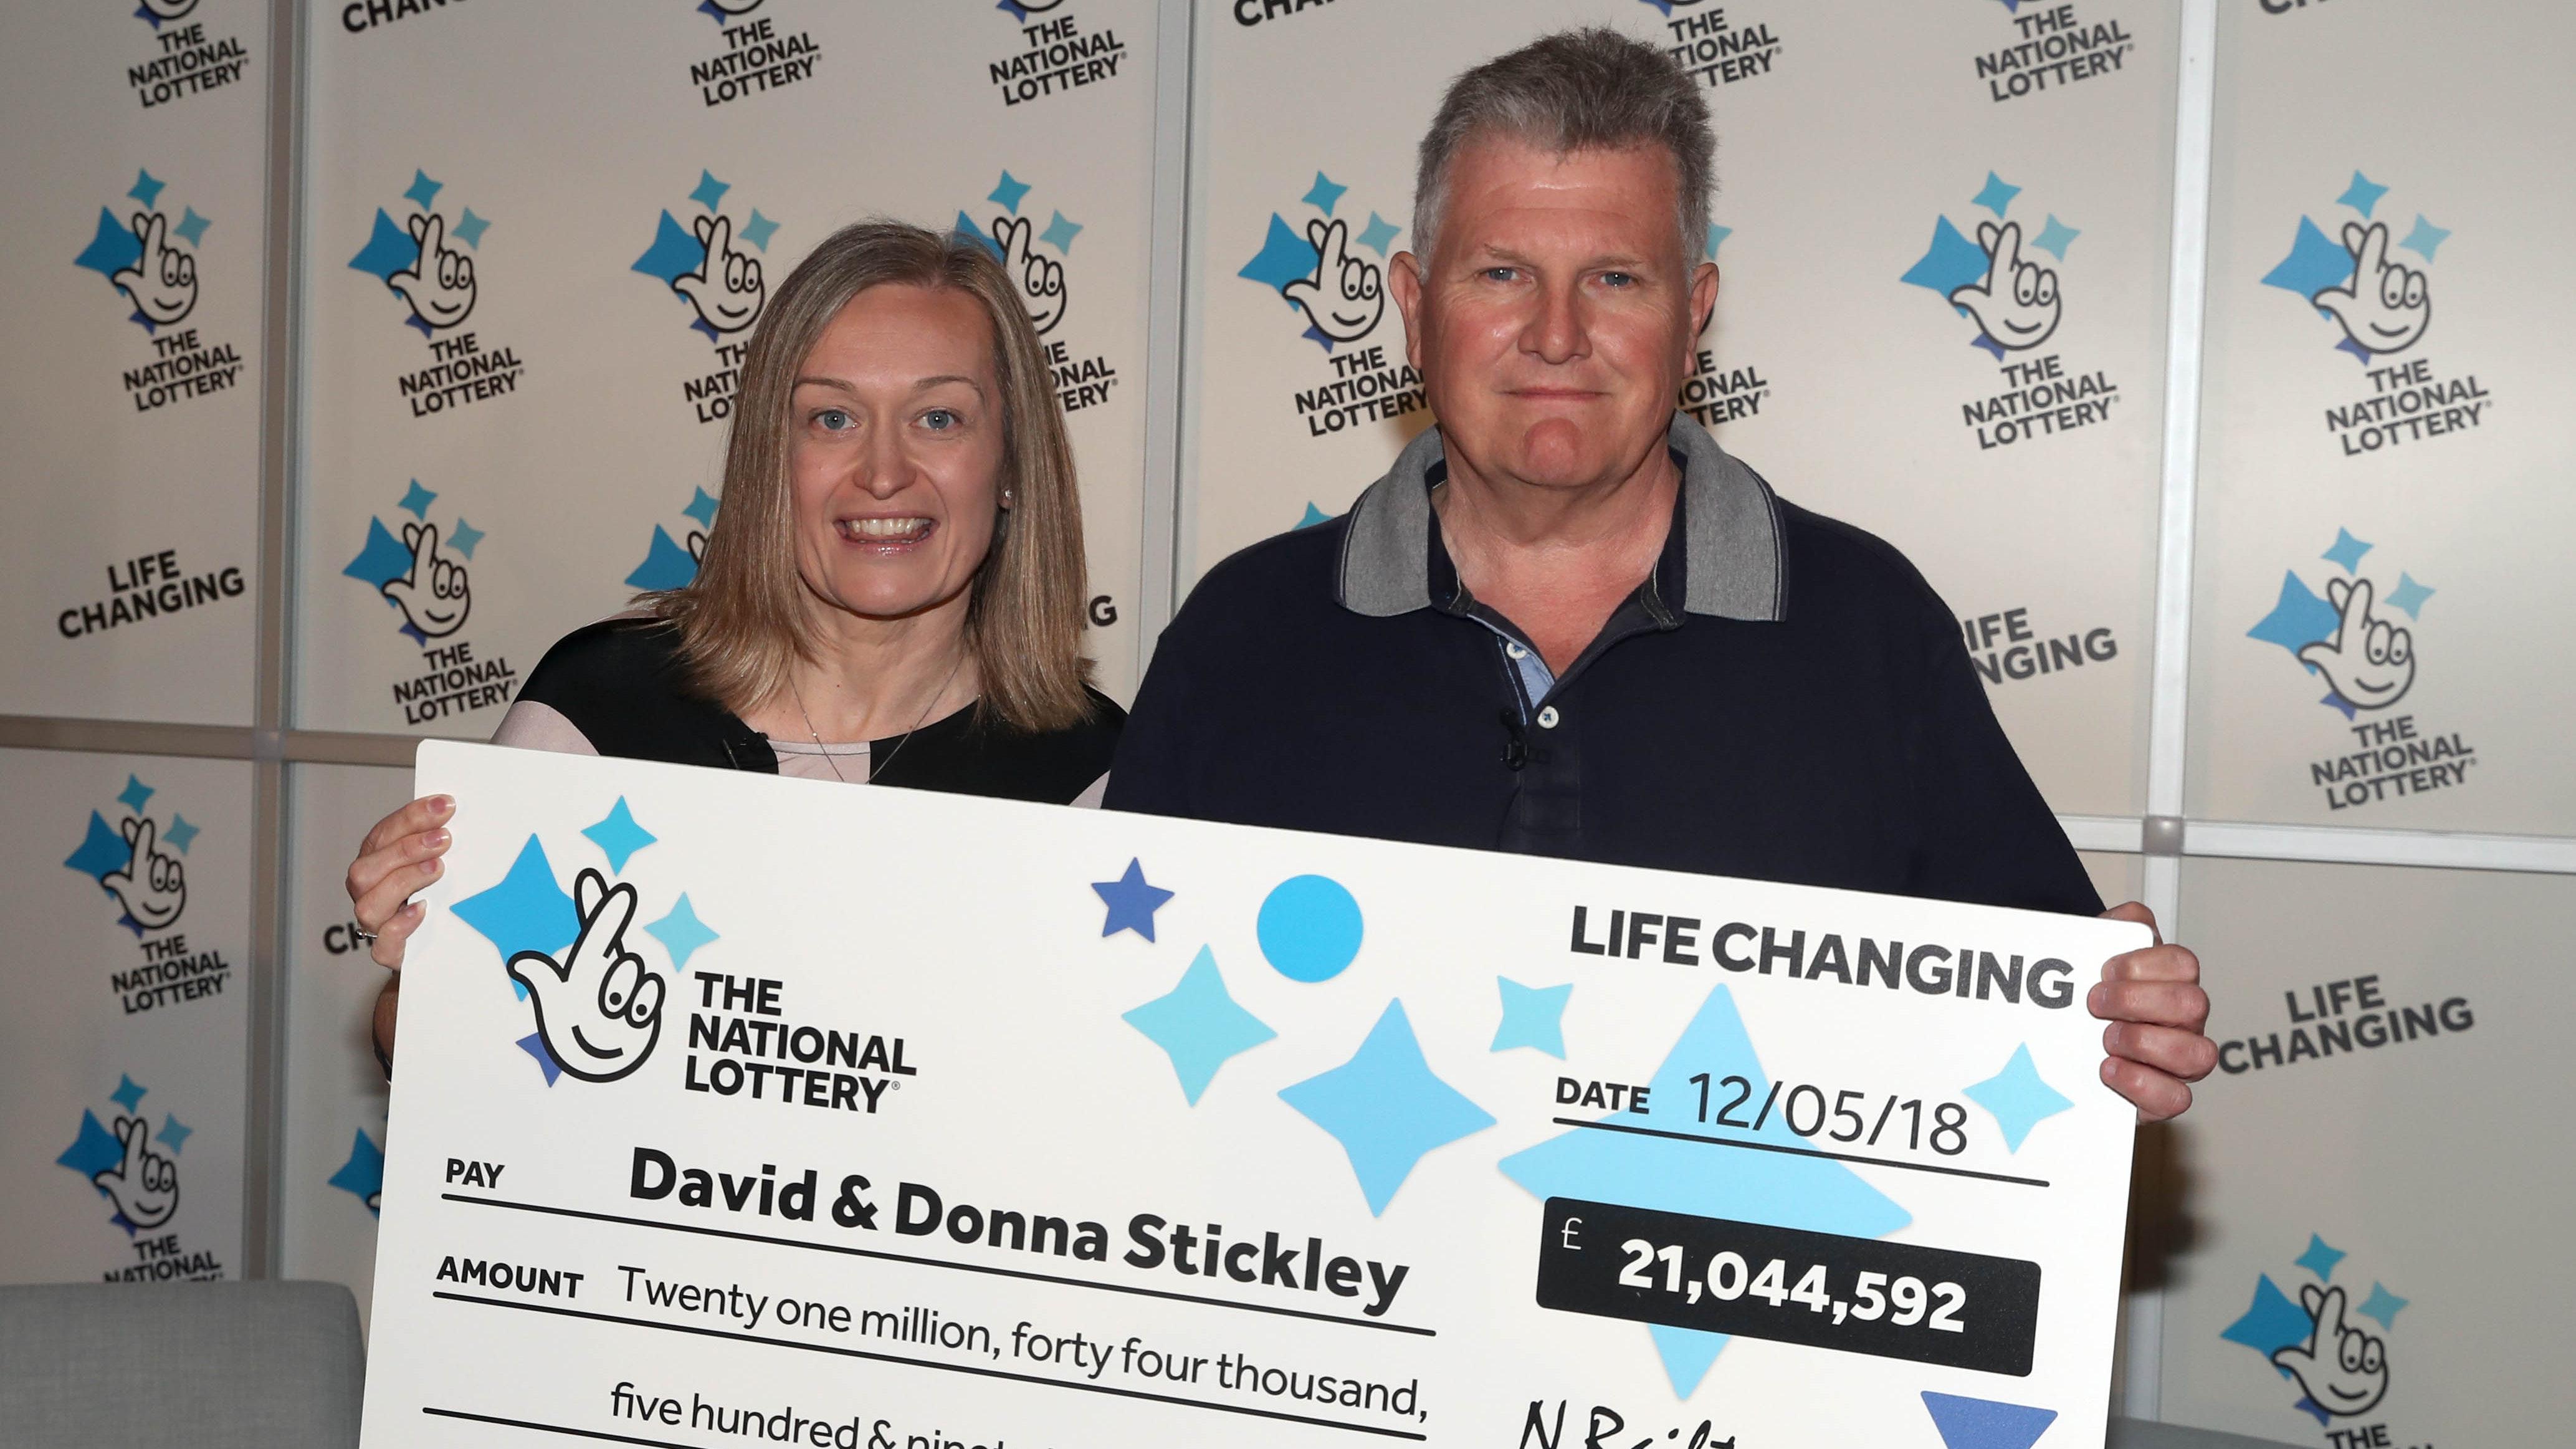 National lottery hundred millionaires dating